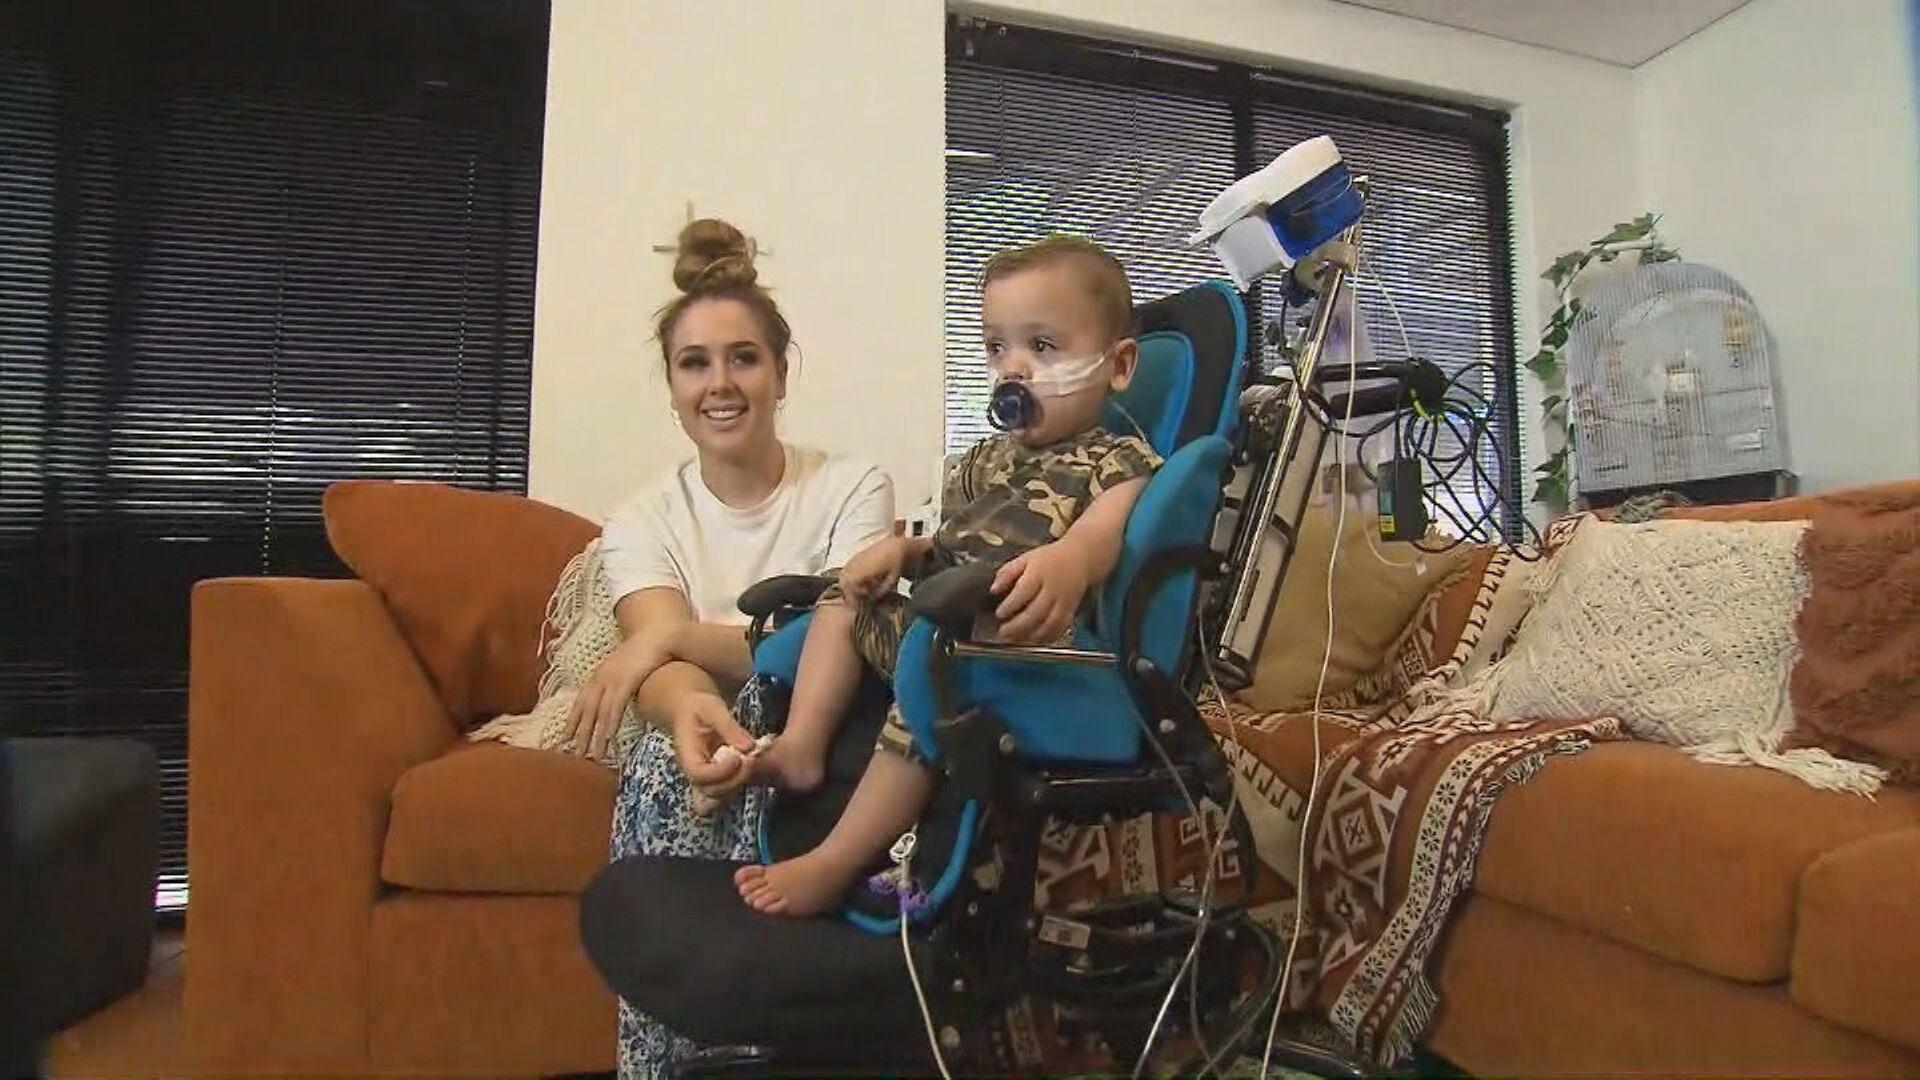 Lifesaving oxygen stolen from sick baby